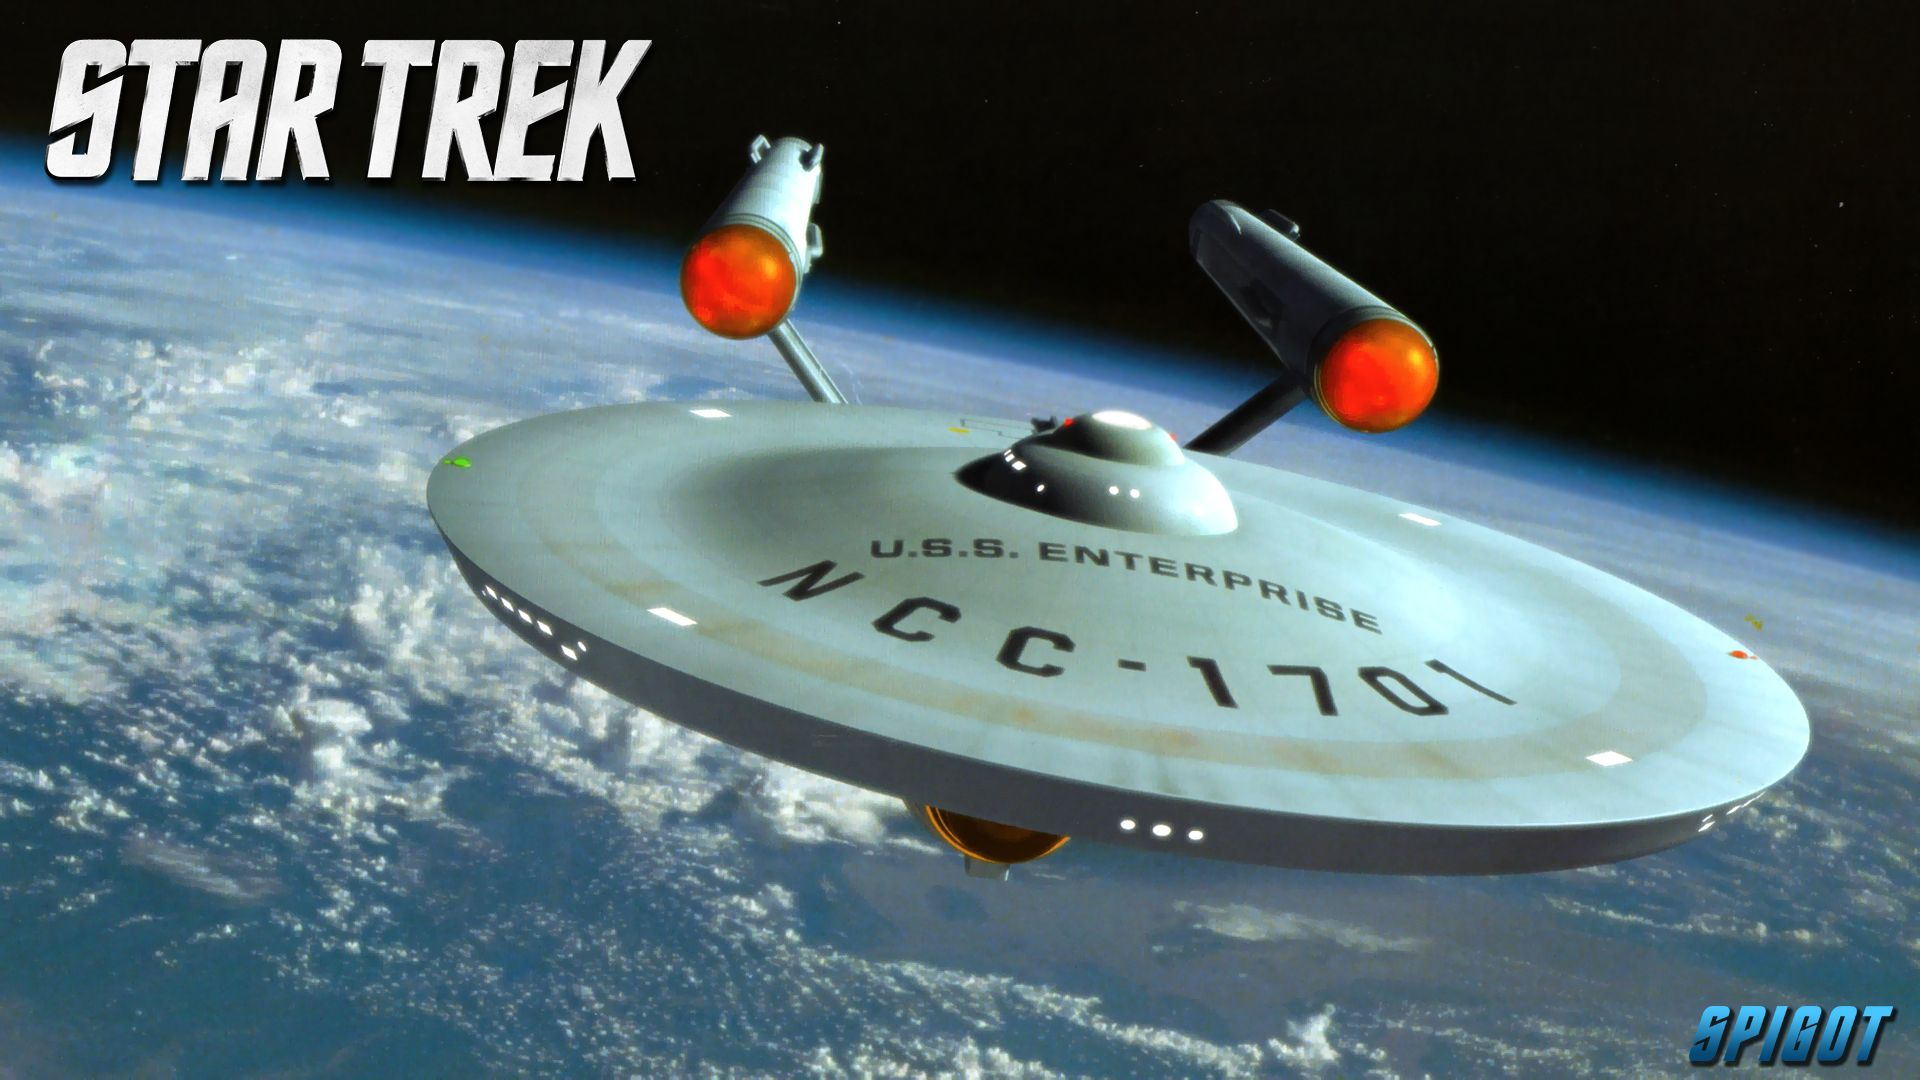 Star Trek Wallpaper Hd 34801 Full Hd Wallpaper Desktop Res